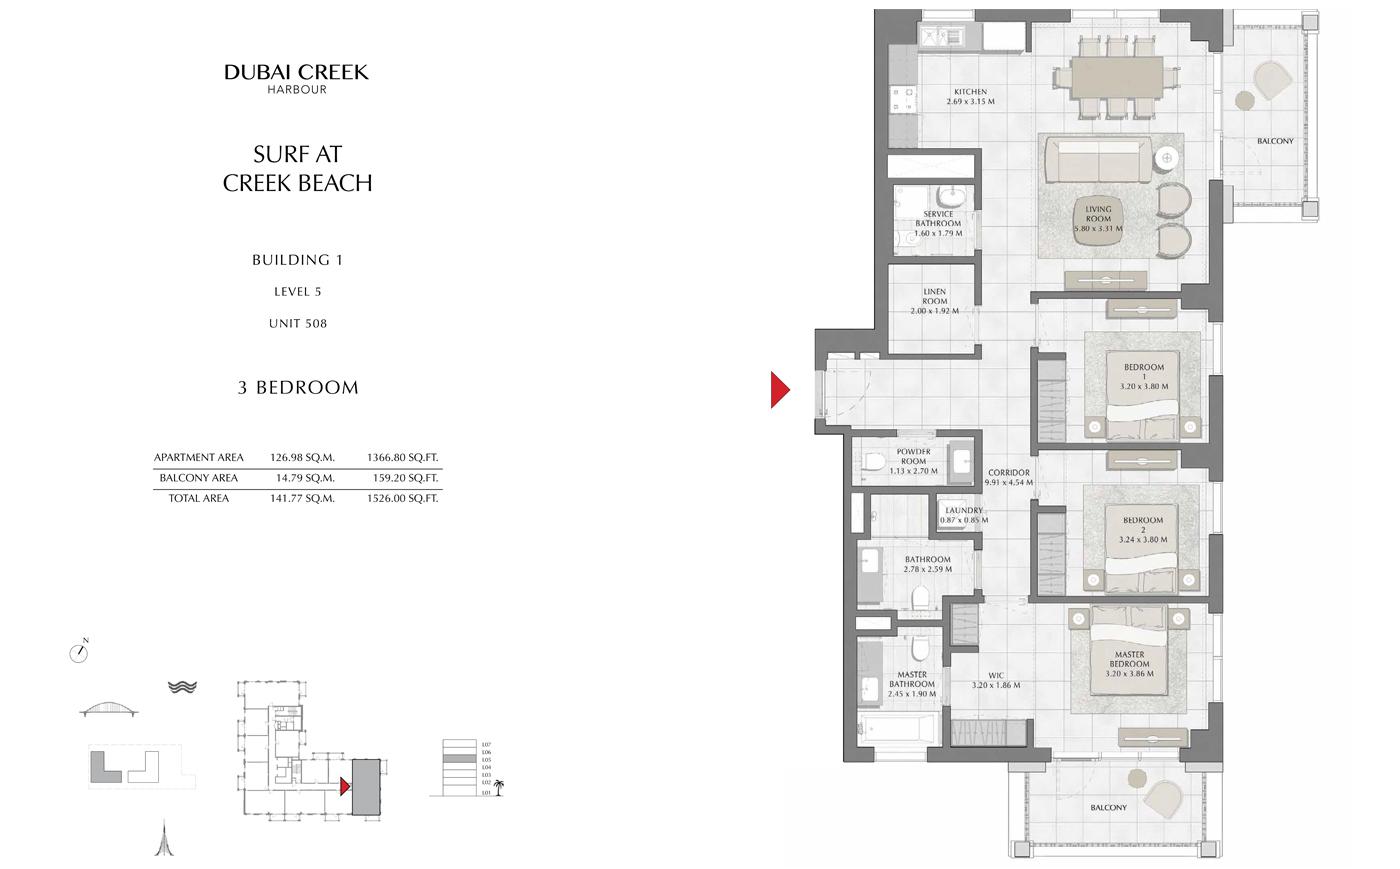 Building 1, 3 Bedroom, Level 5, Size 1526 Sq Ft